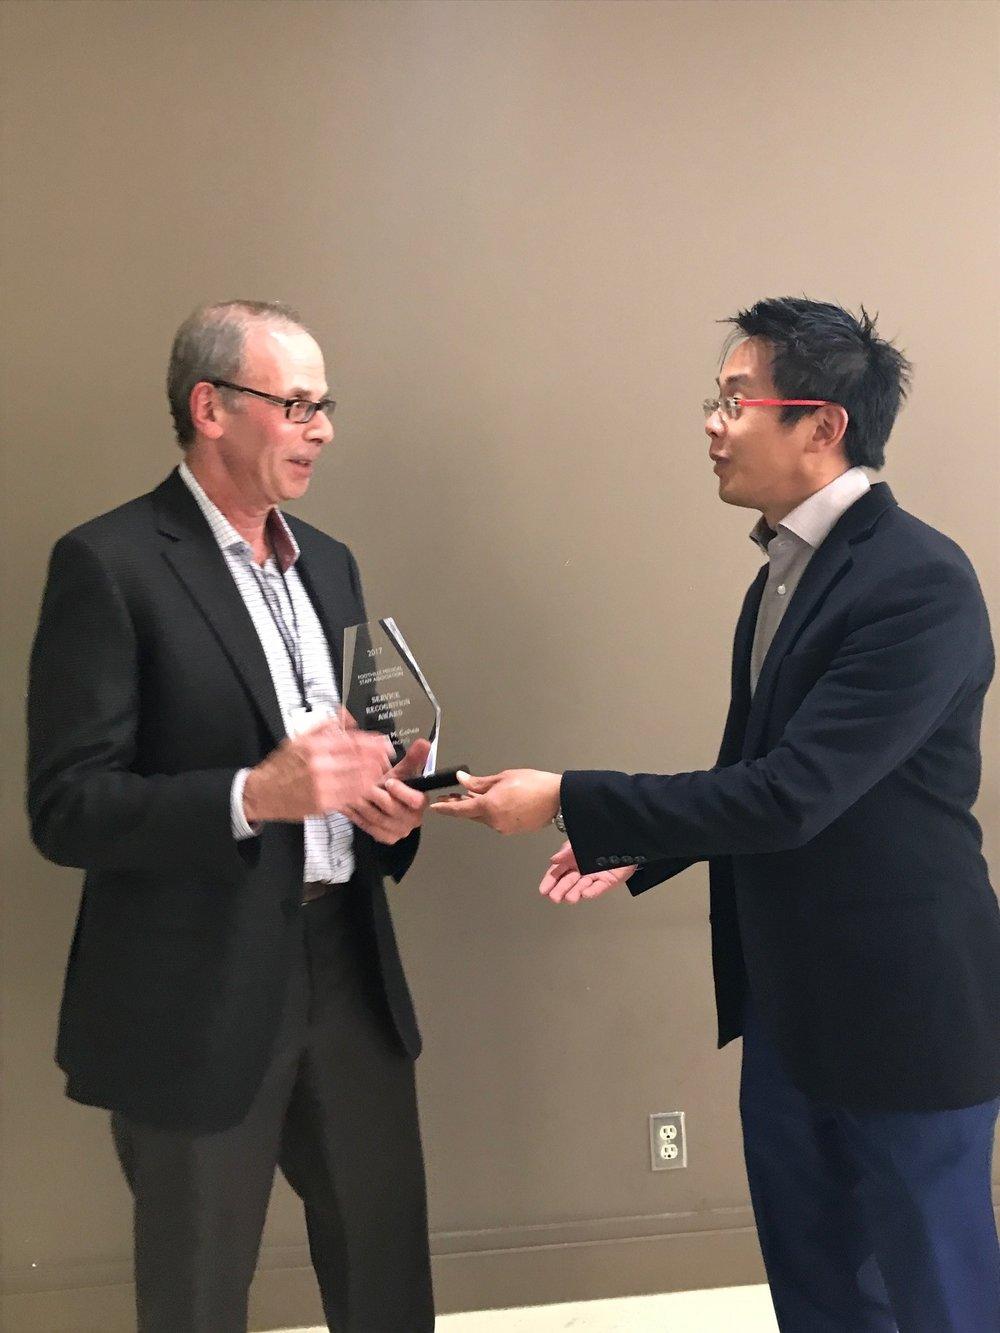 Dr. Cohen & Dr. Chan.JPG